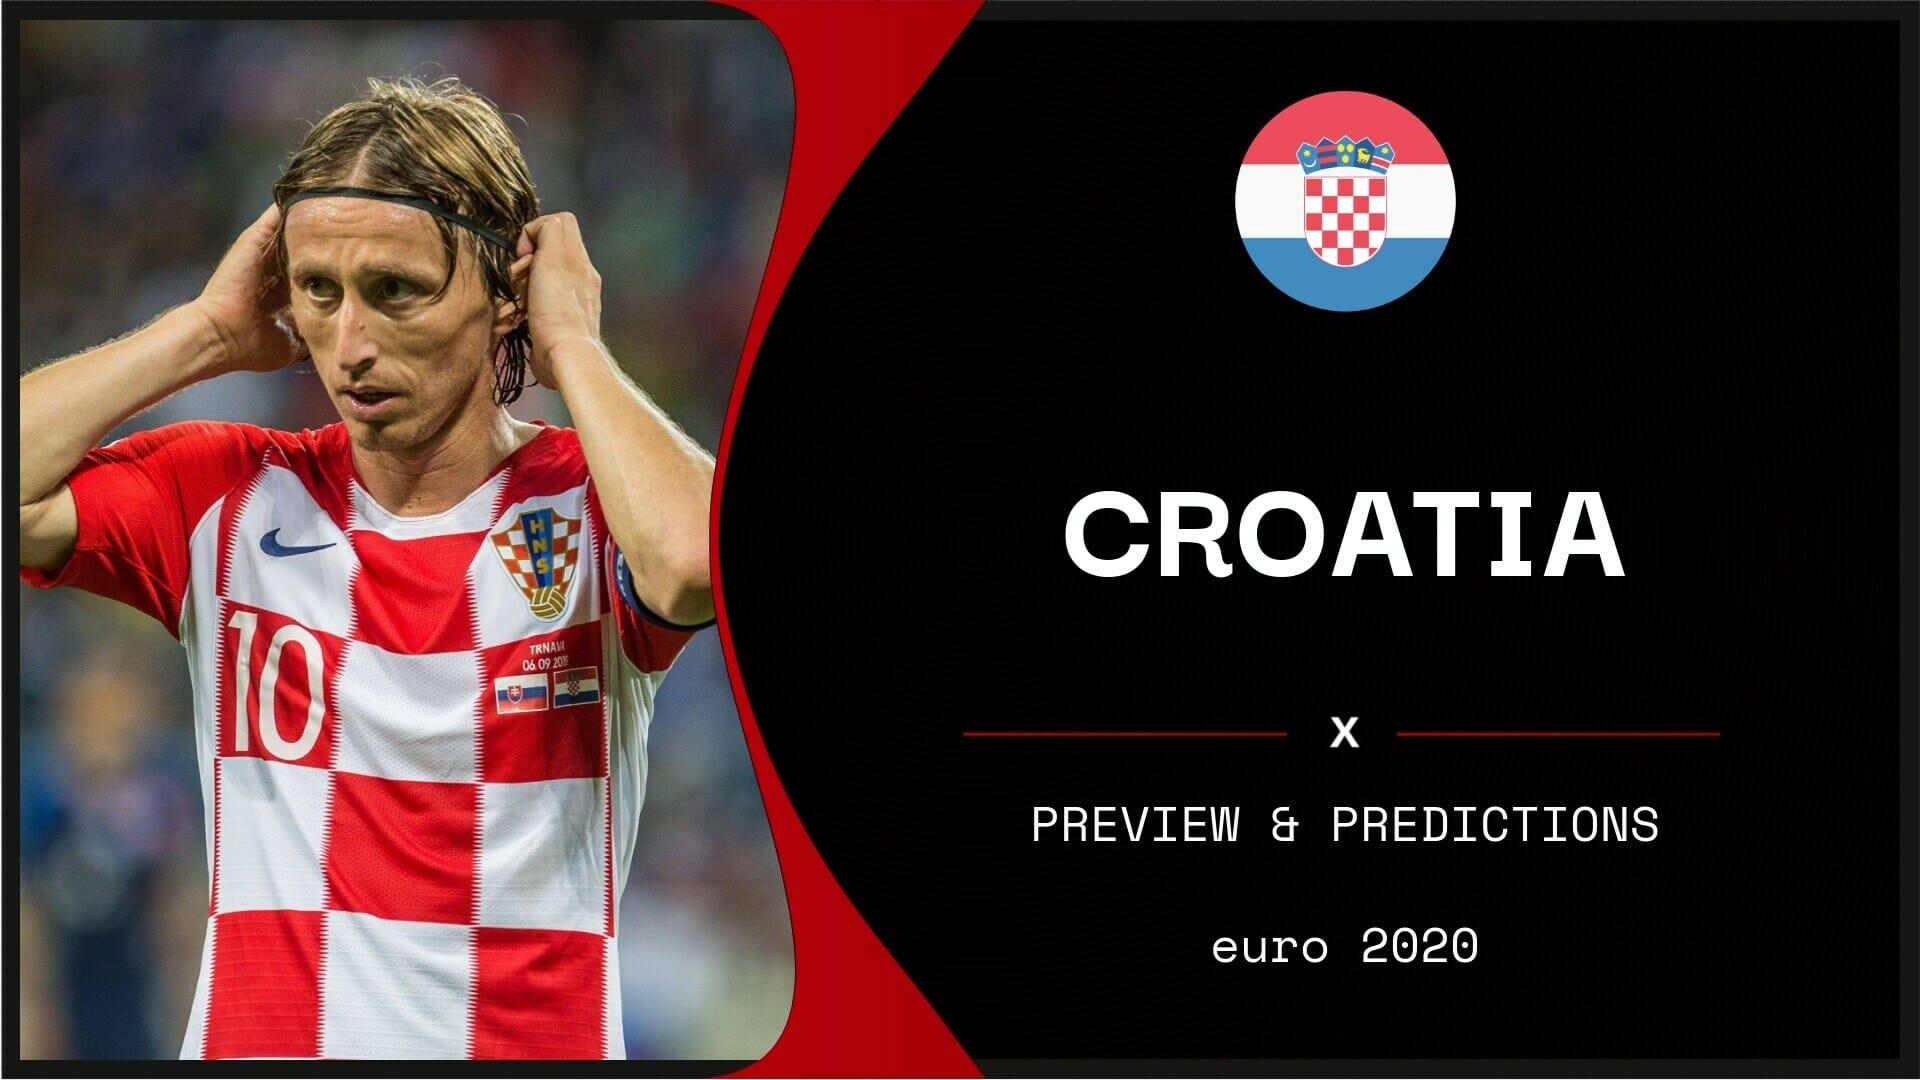 CroatianSports.com's Predictions For EURO 2021: 9 Burning Questions